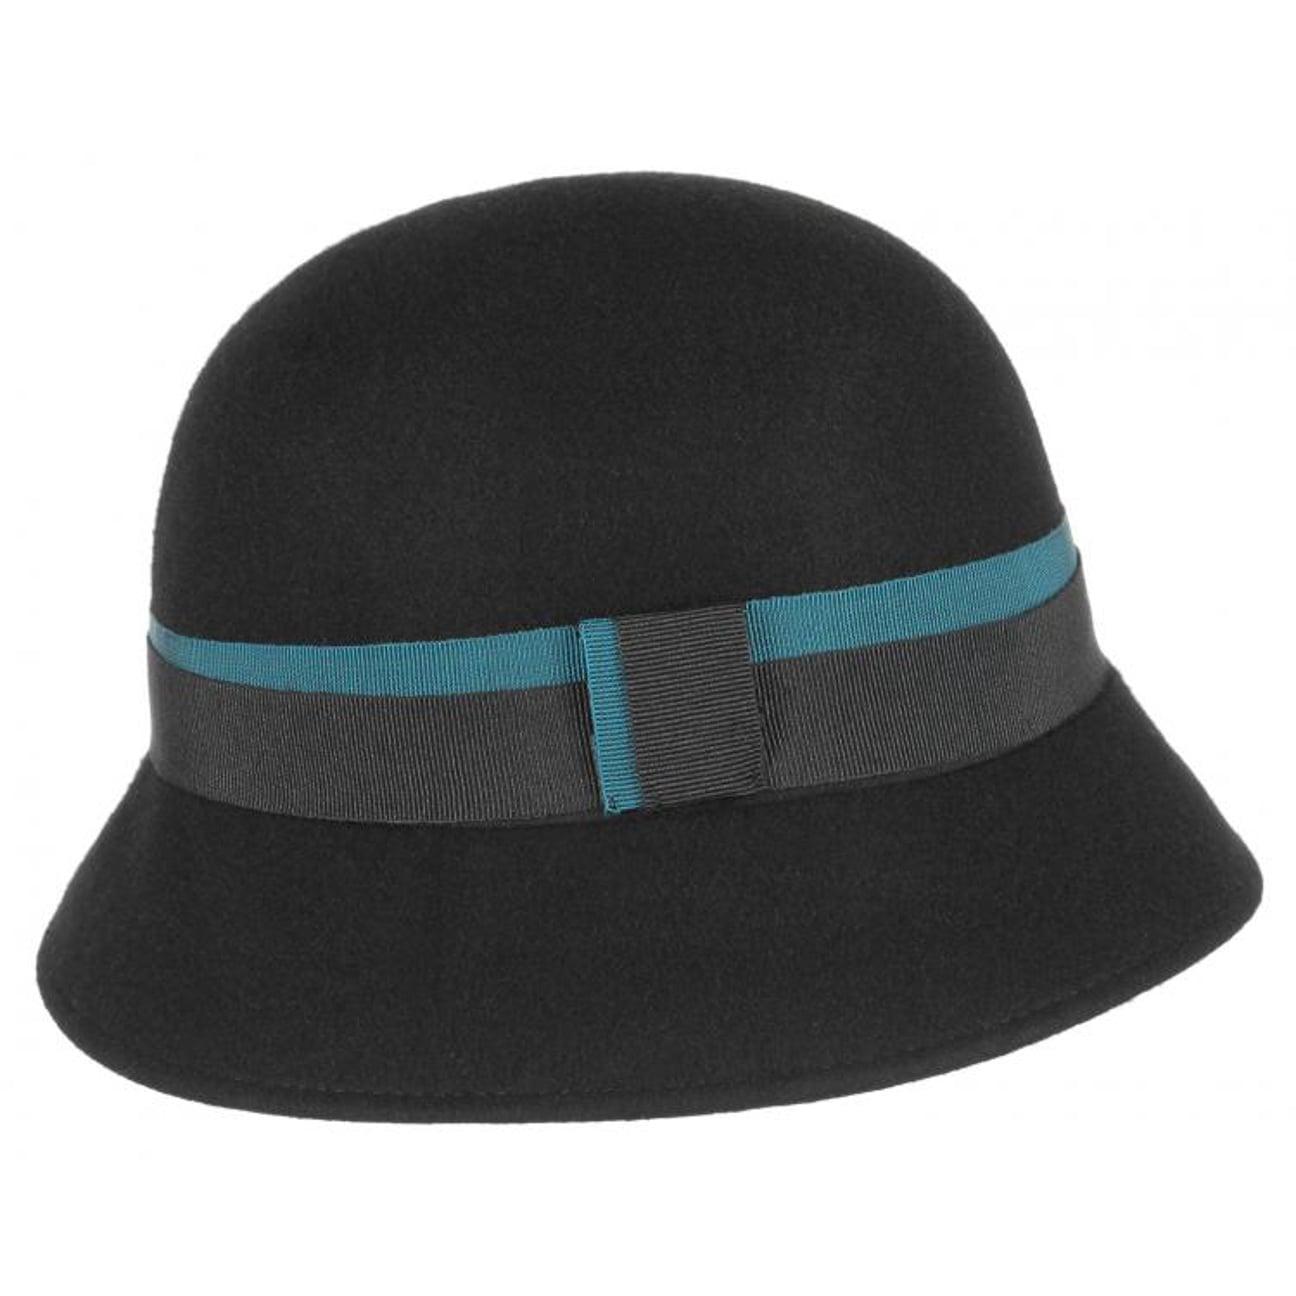 Cascavel Hat for Women - Sombreros - sombreroshop.es bd31448ee6f